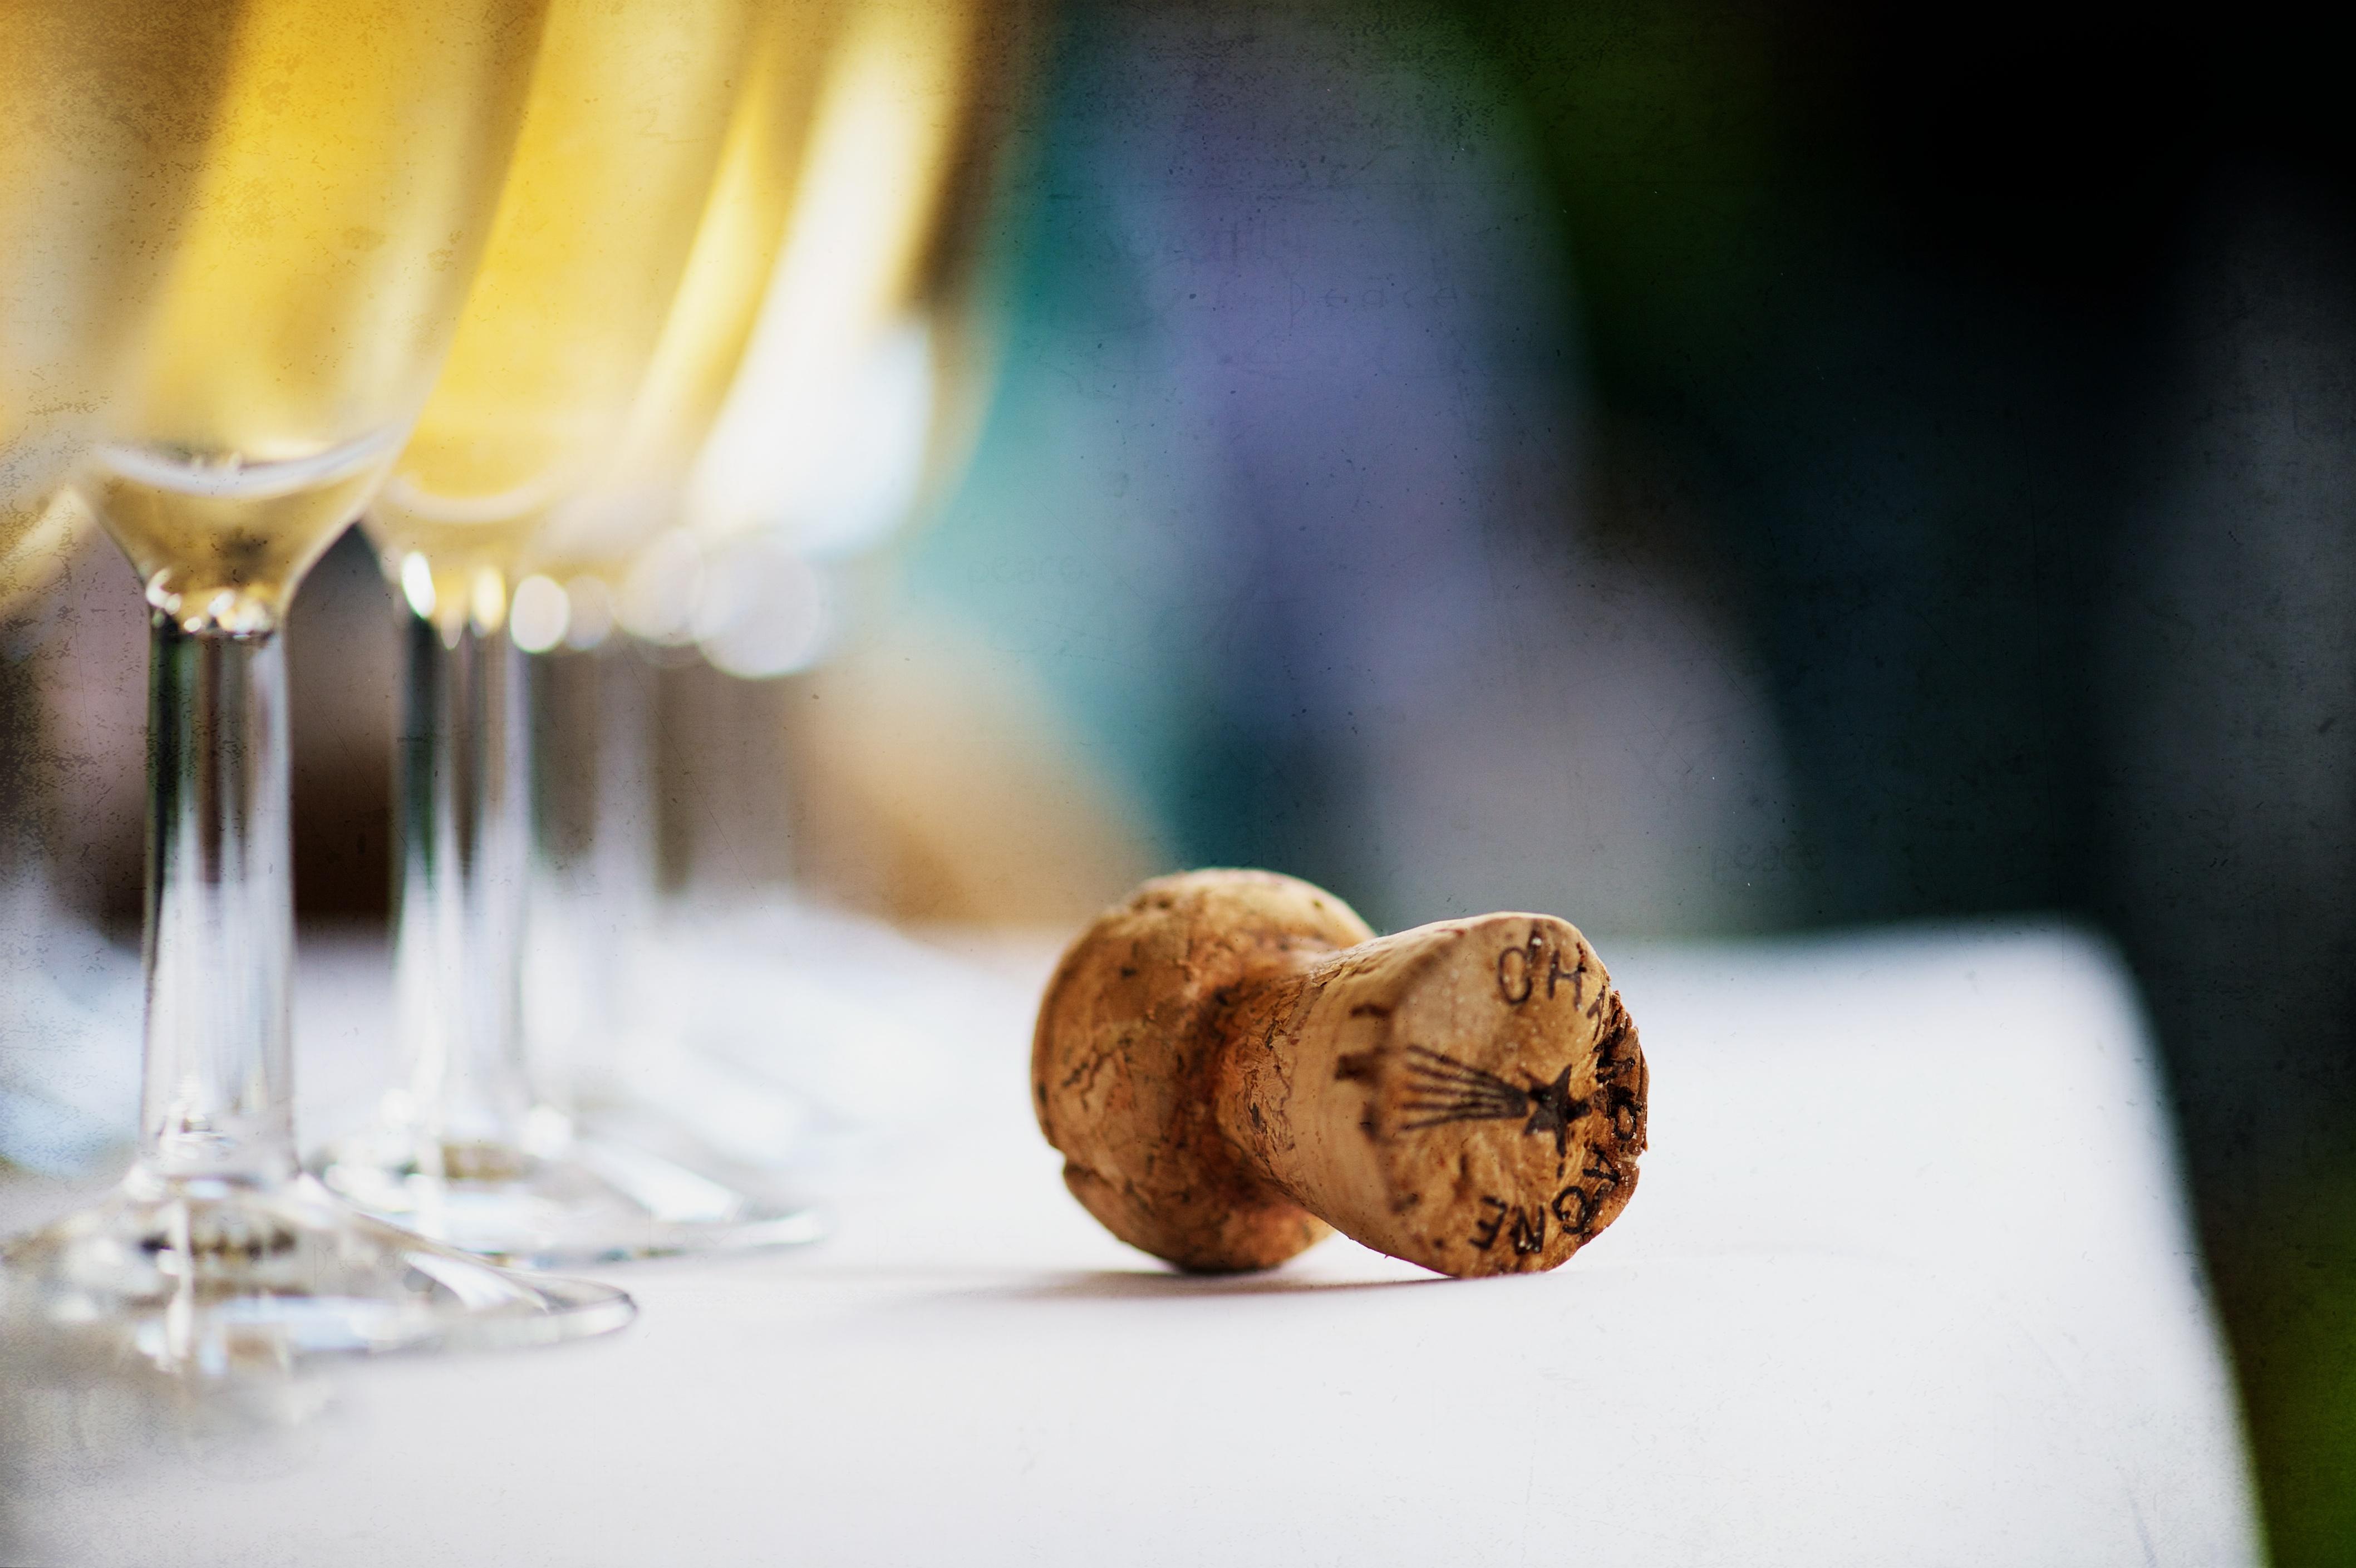 Champagne Cork and Glasses